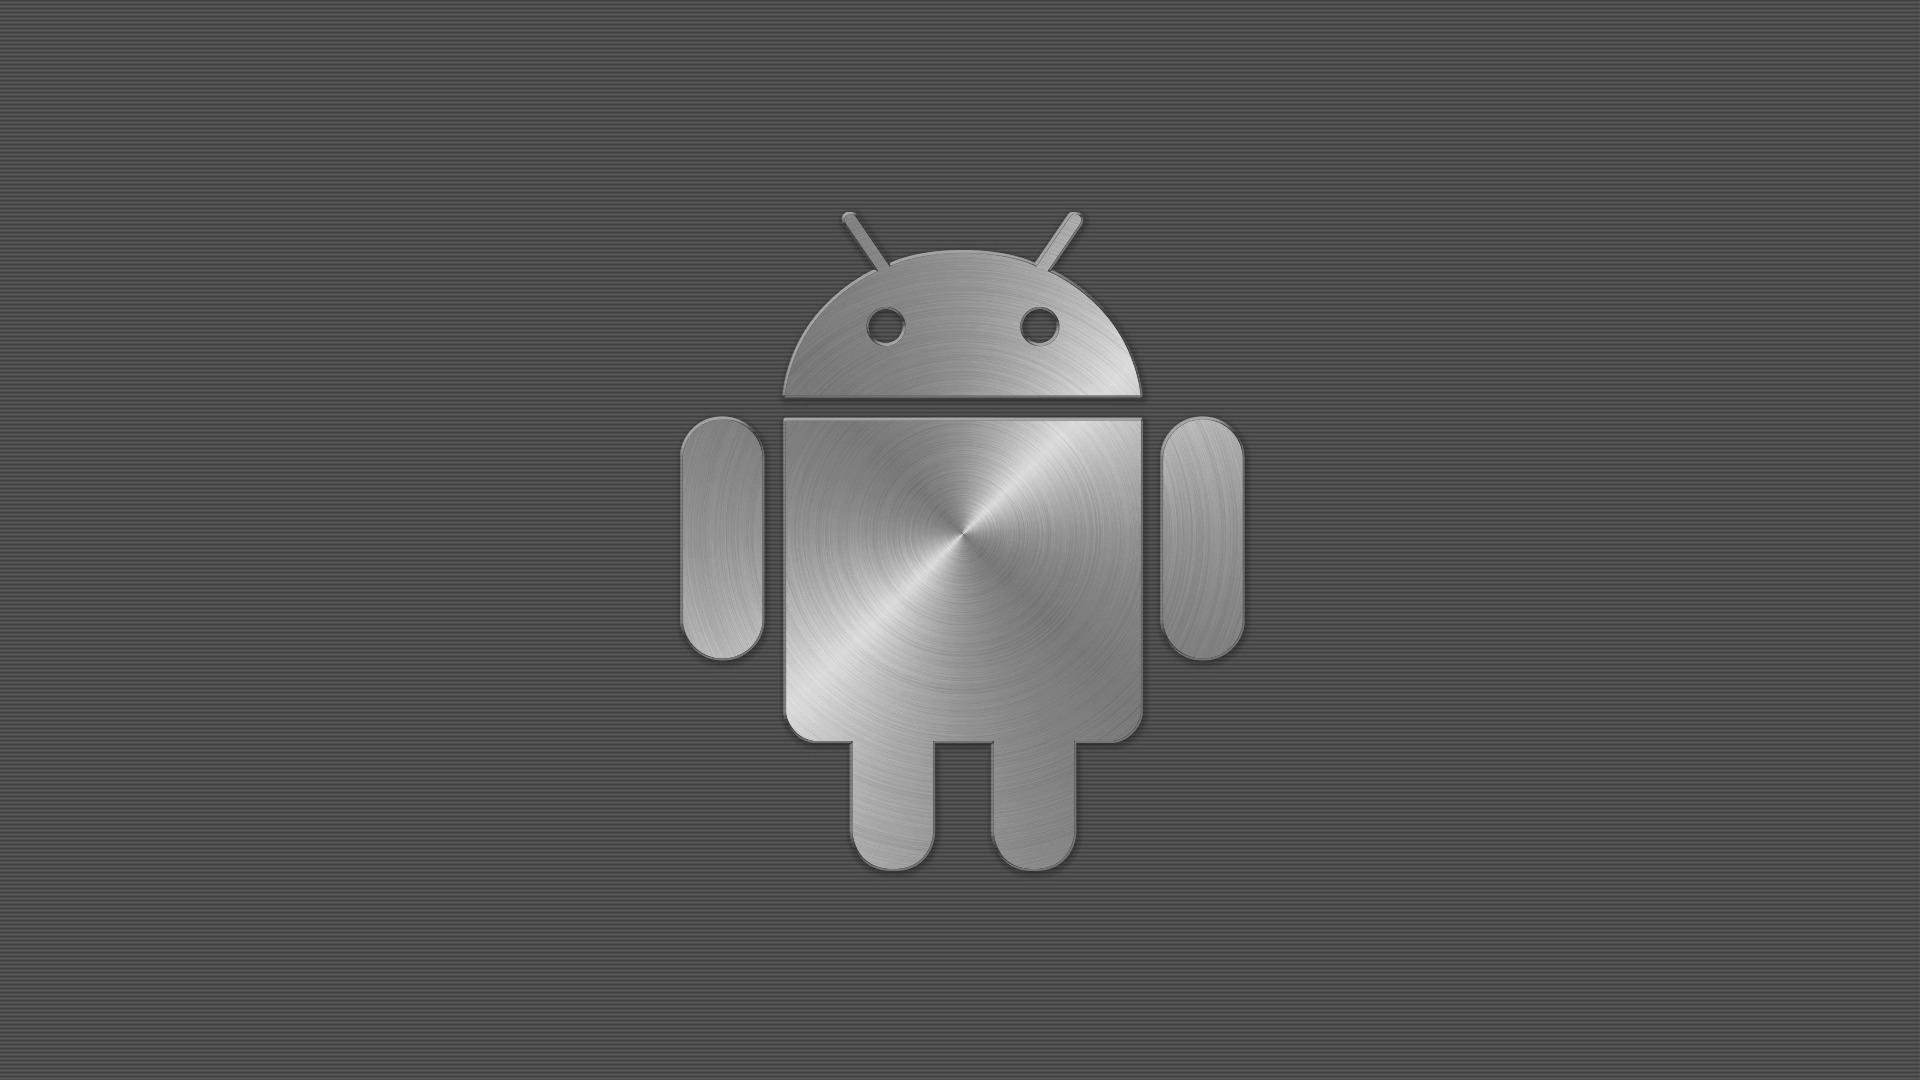 metal logo android wallpaper wallpaper | wallpaperlepi